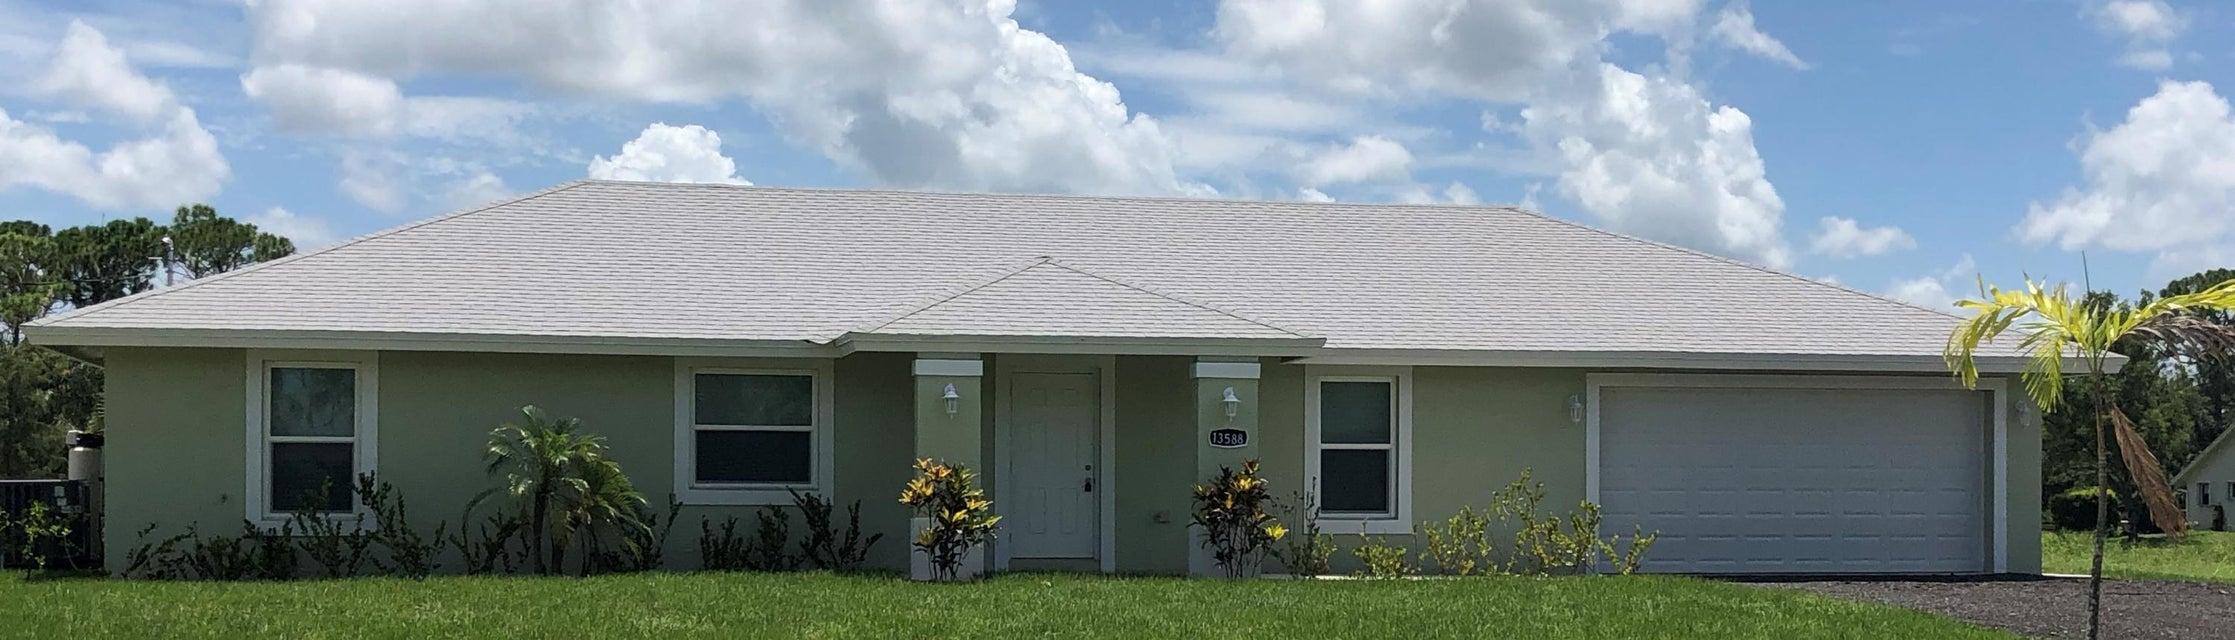 13588 Key Lime Boulevard West Palm Beach, FL 33412